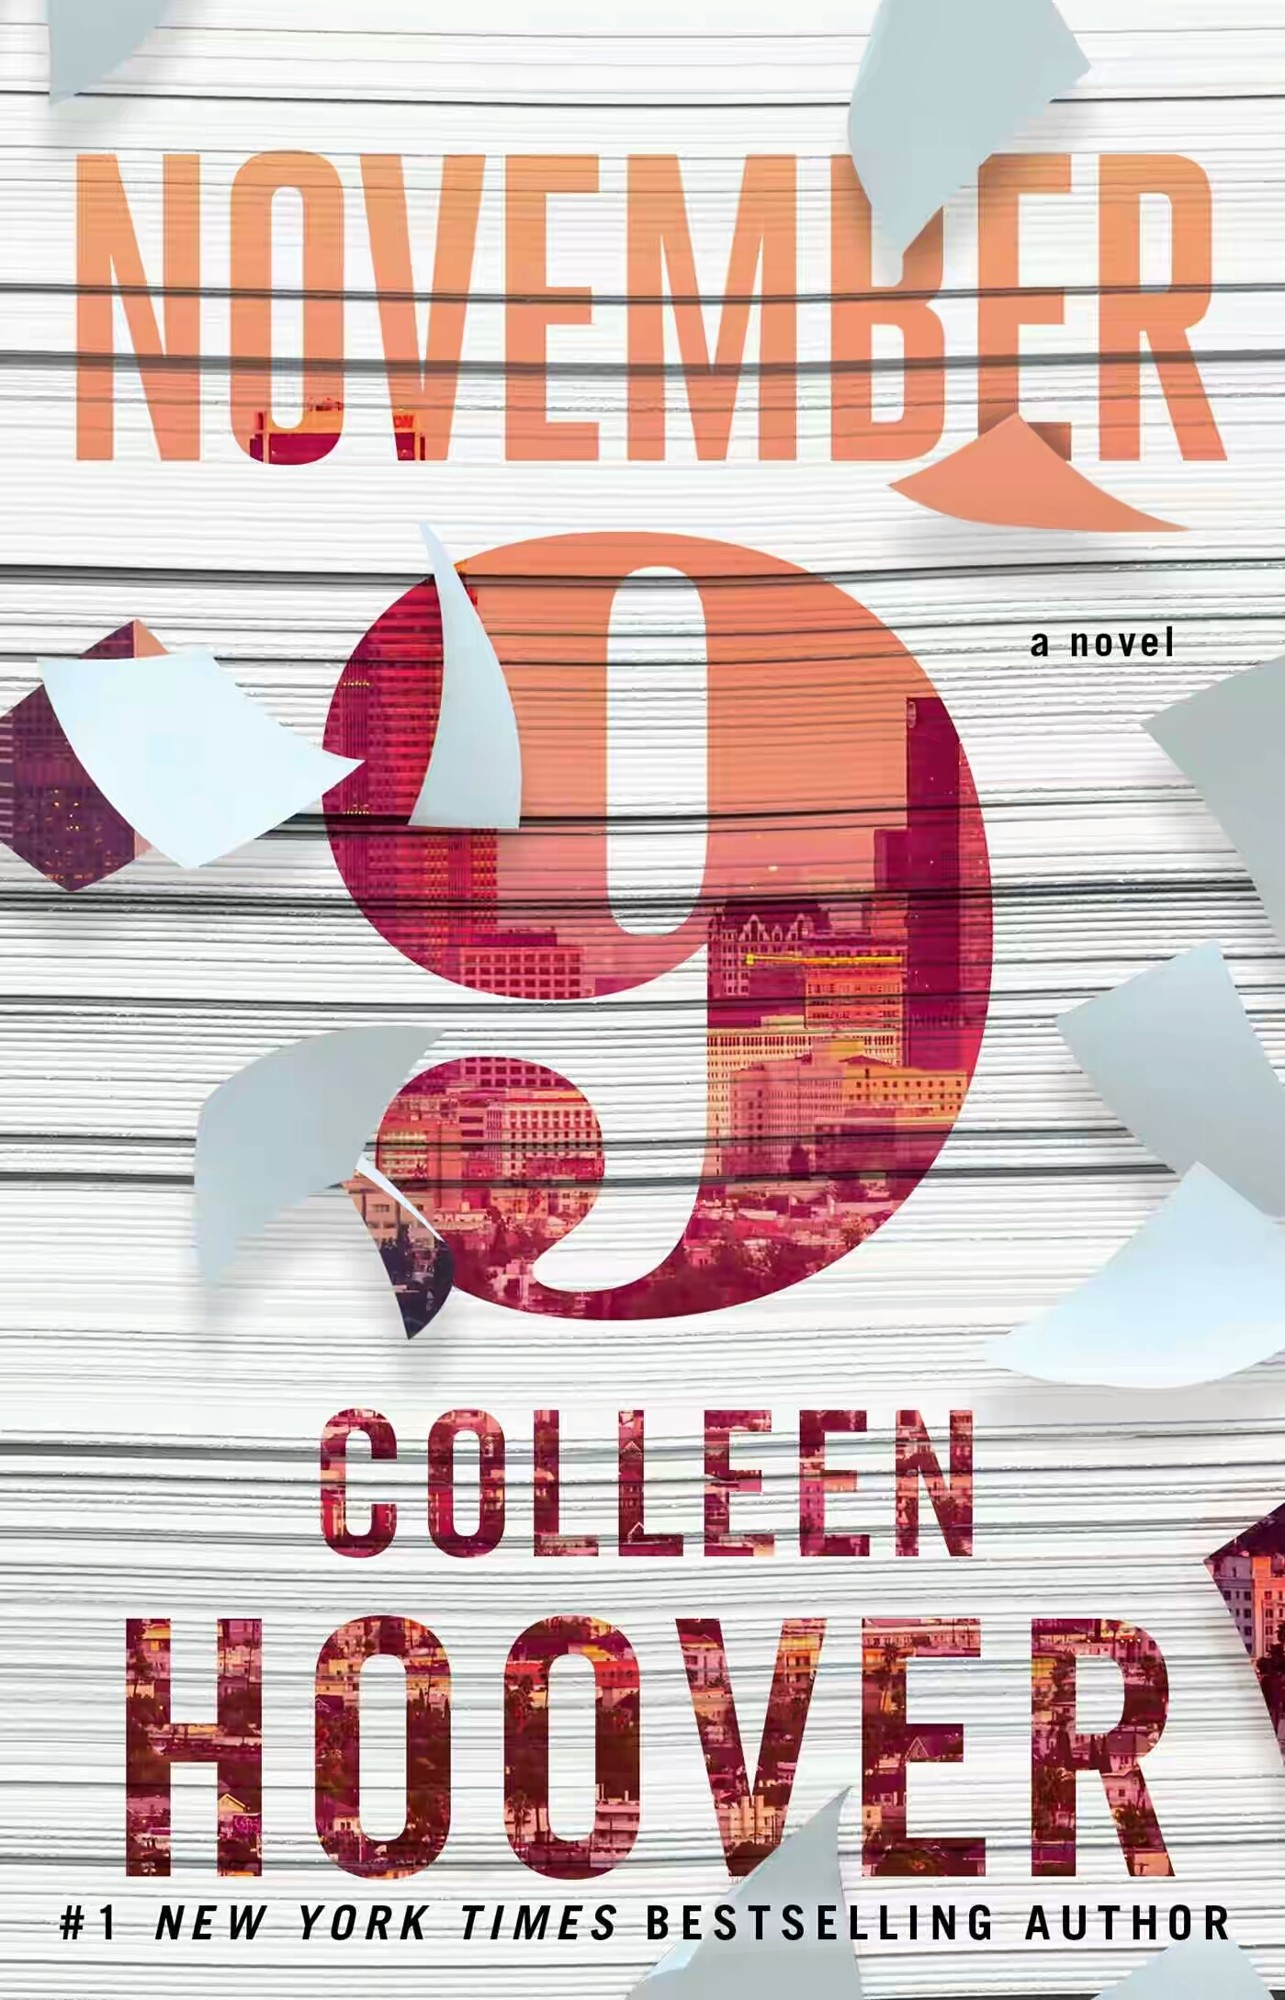 November 9 – Colleen Hoover